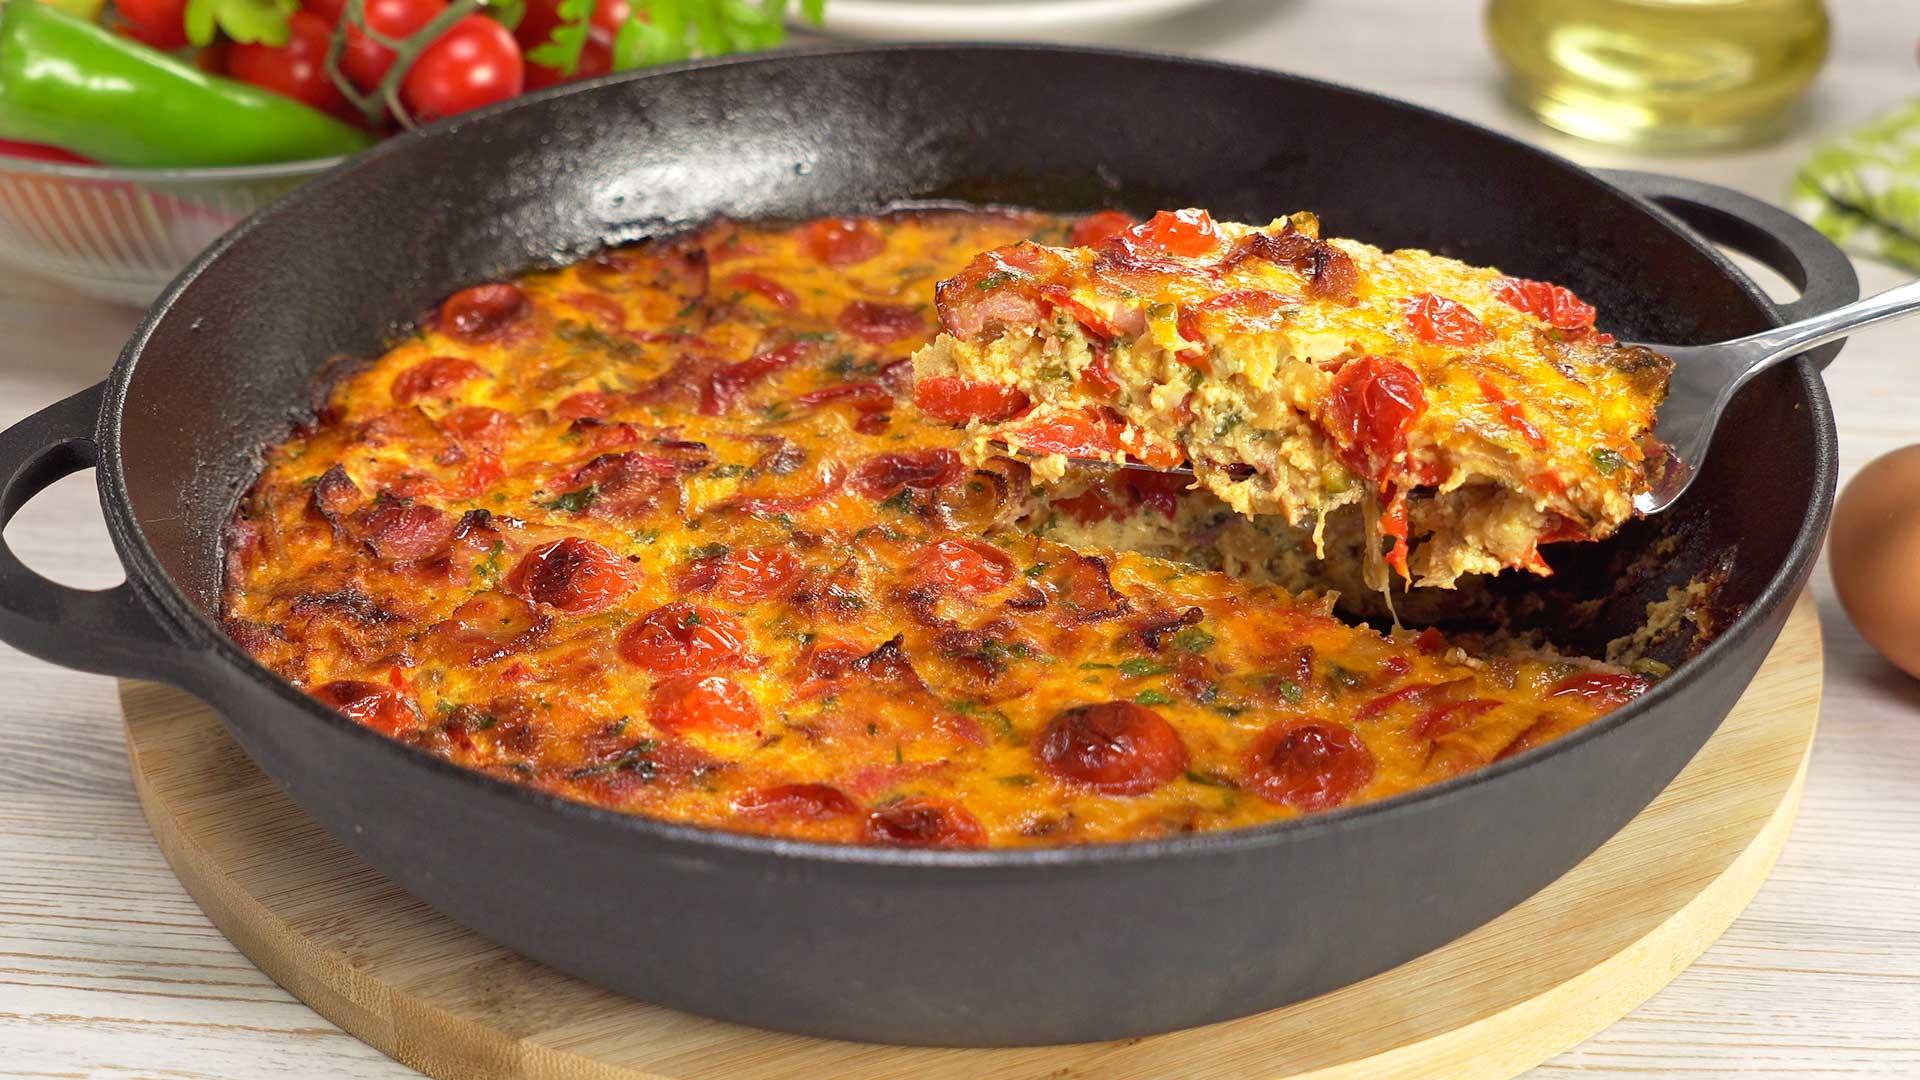 Фриттата / Frittata Итальянская кухня